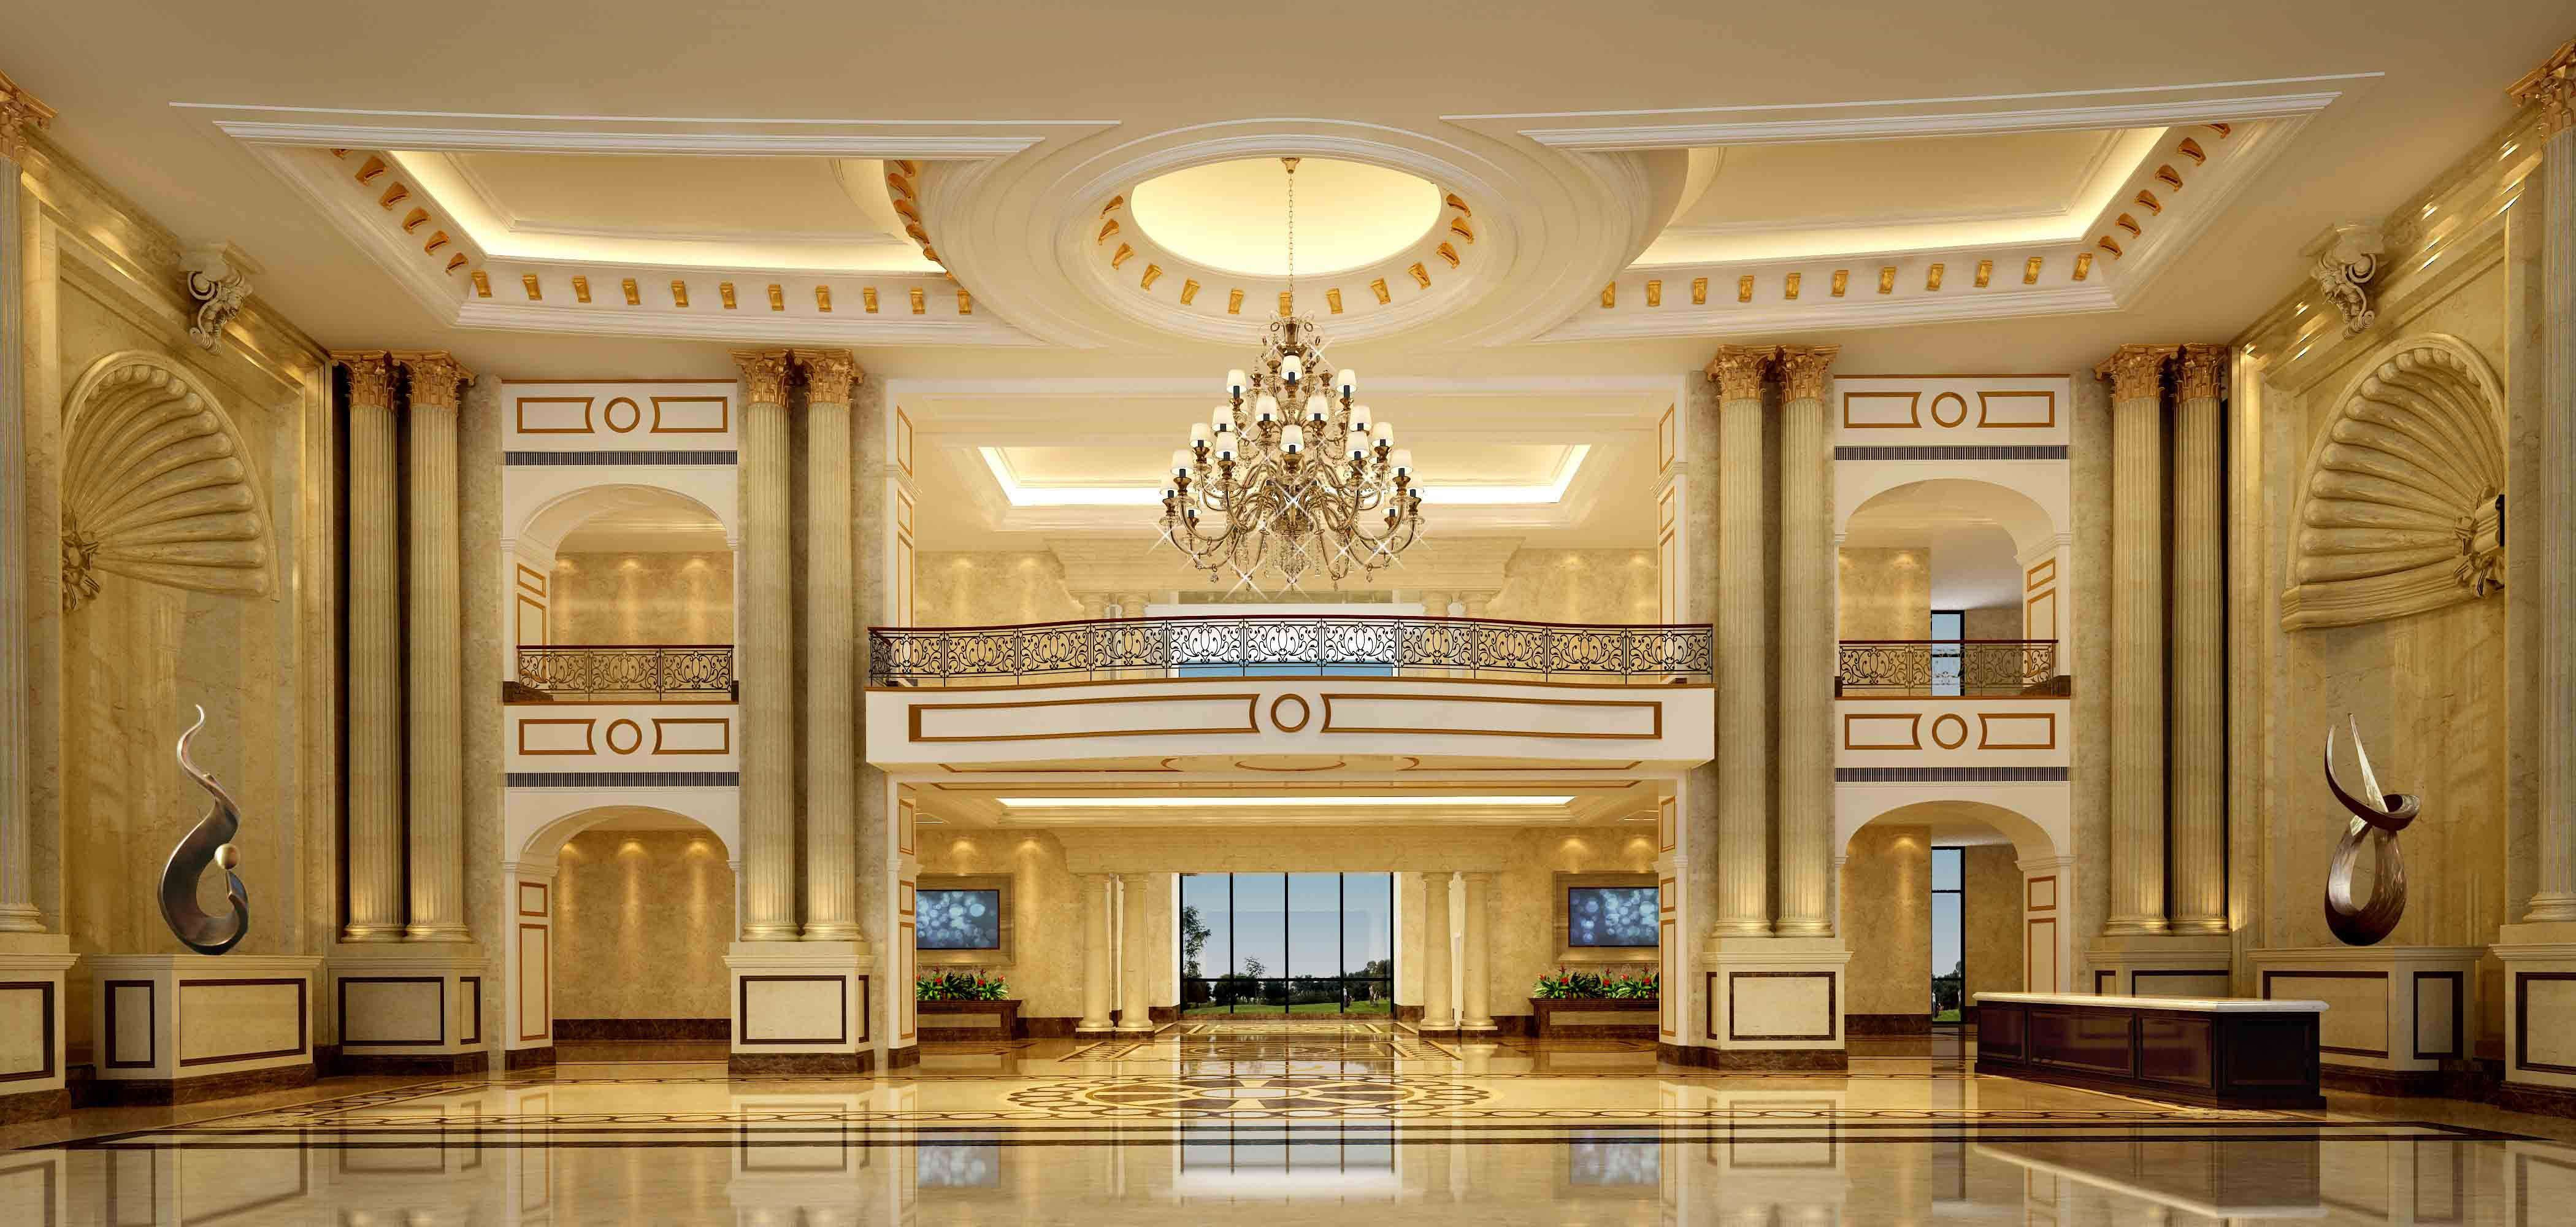 Luxury Lobby 3d Model Lobbies Hall And Luxury